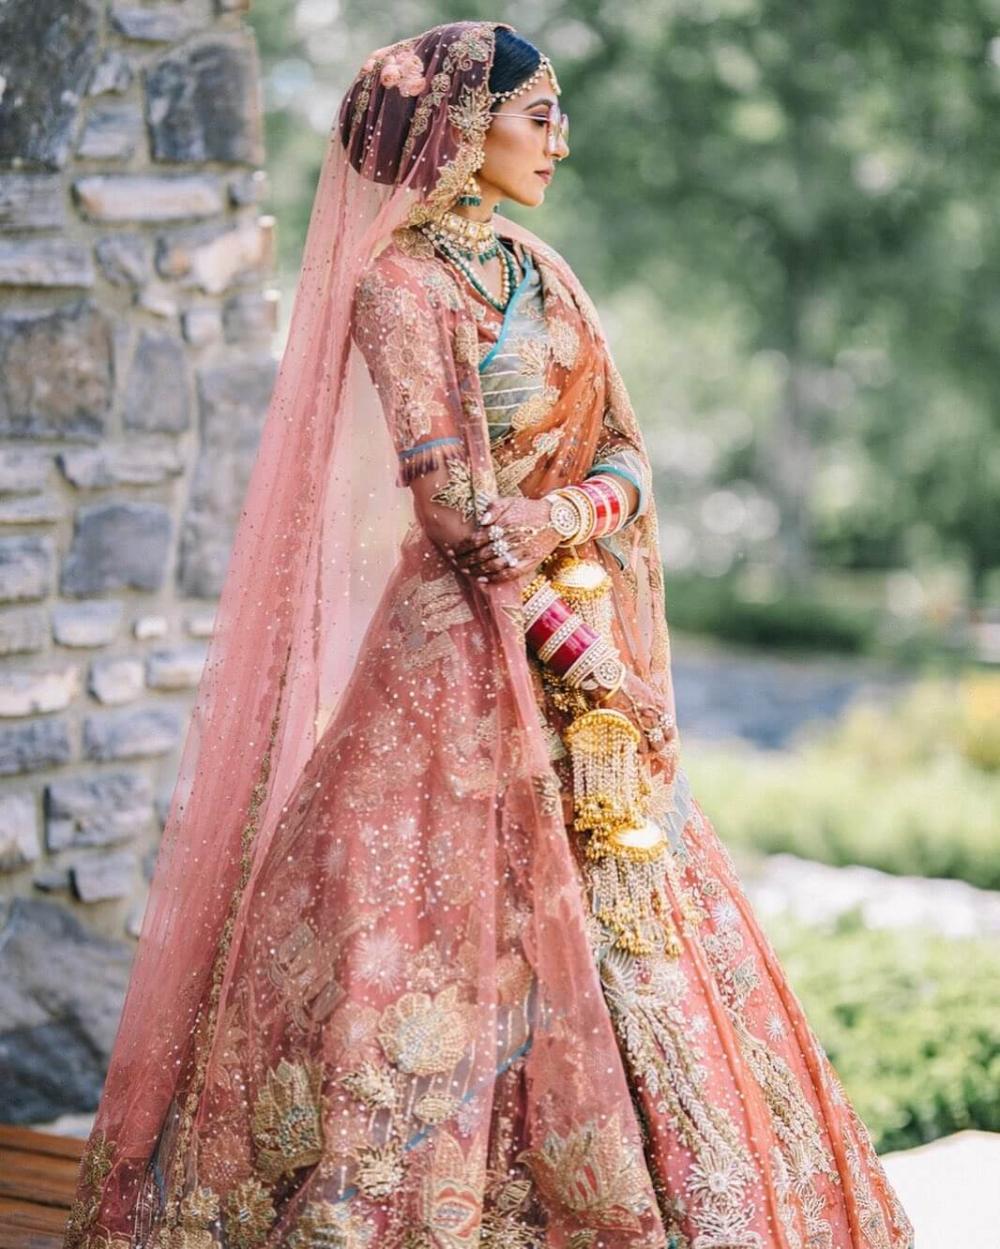 Latest Bridal Lehenga Color Combinations That Are Going To Rule 2020 In 2020 Latest Bridal Lehenga Lehenga Color Combinations Bridal Lehenga Red